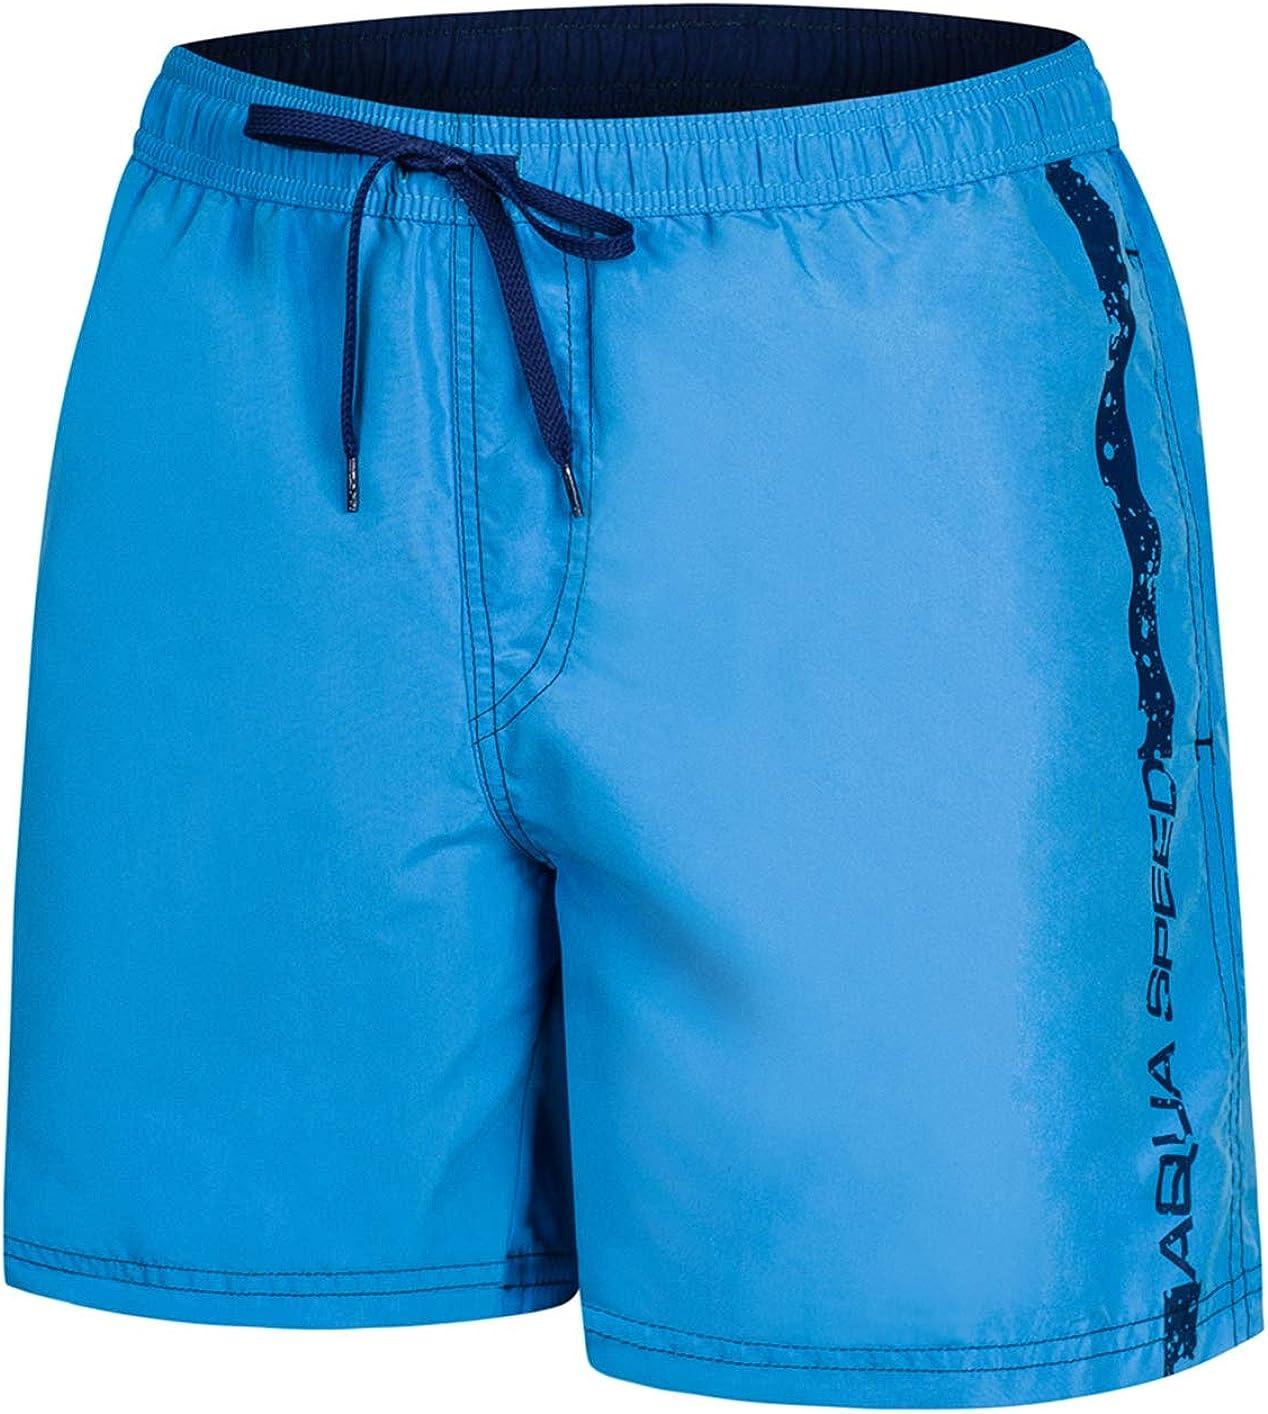 Aqua Speed 5908217667007 Ace Swim - Bañador para Hombre, Talla S, Color Azul Claro y Azul Marino